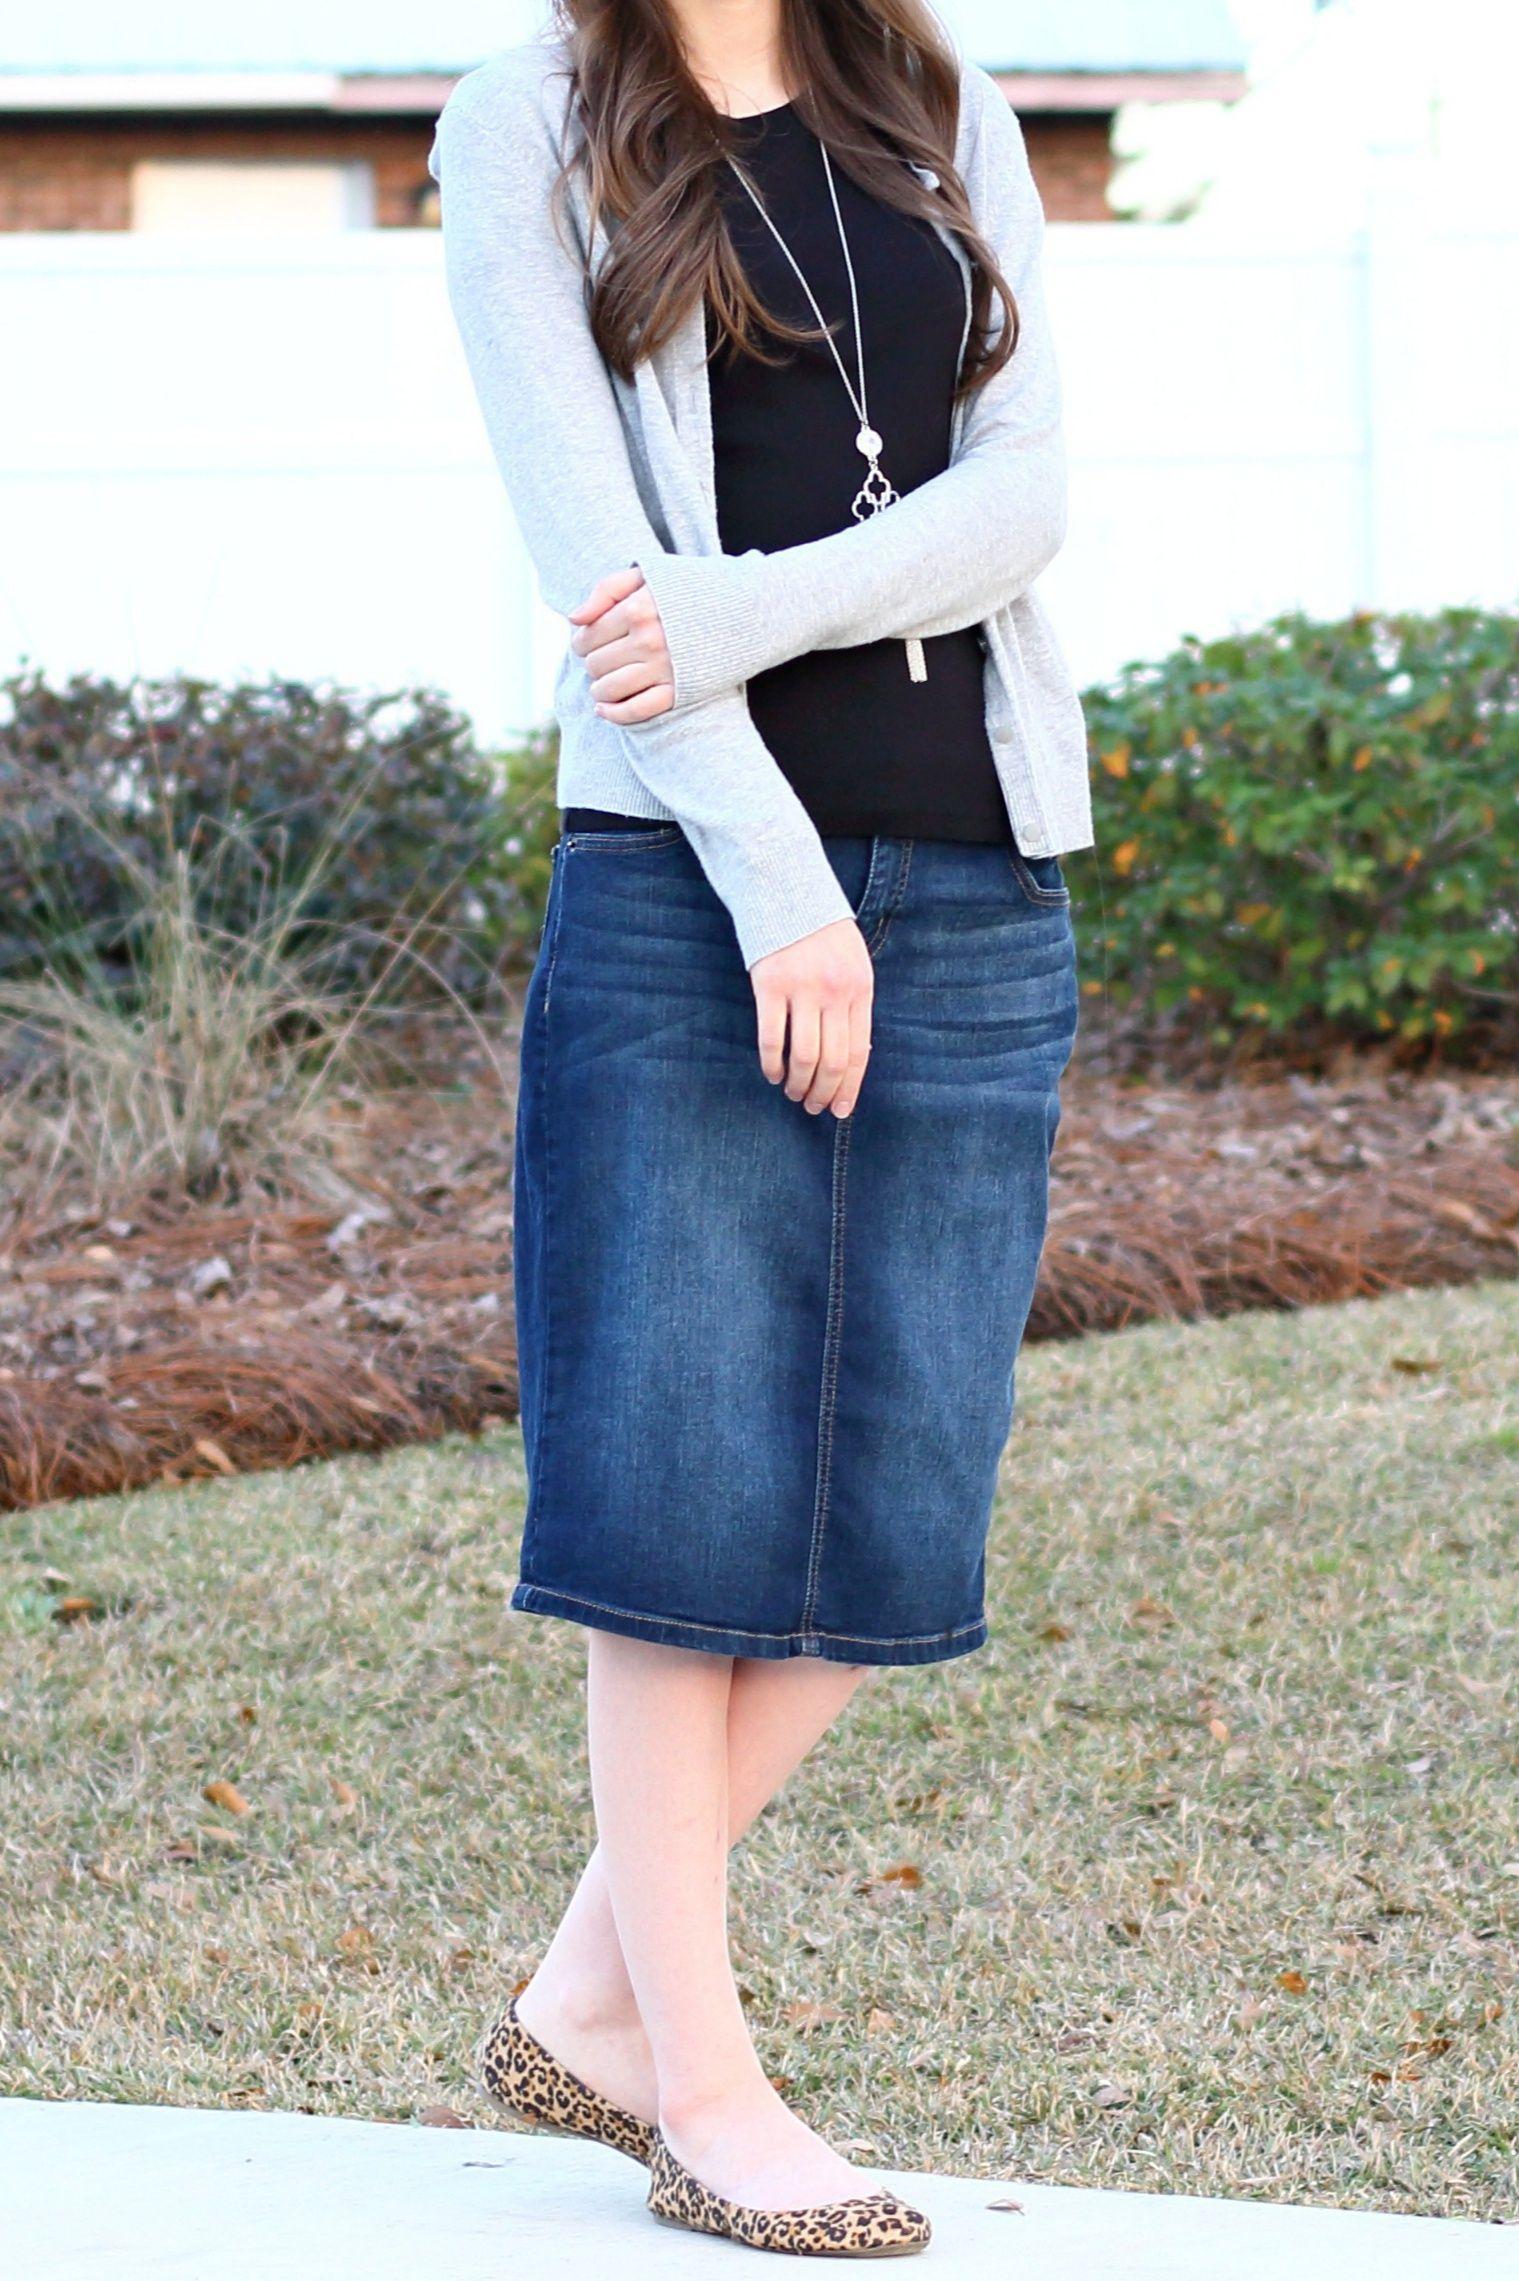 b49c0f1ea5 Modest Casual Outfit Idea for Church//Denim Skirt//Leopard Print  Flats//Gray Cardigan//Black Tee//Fall/Spring Style ...